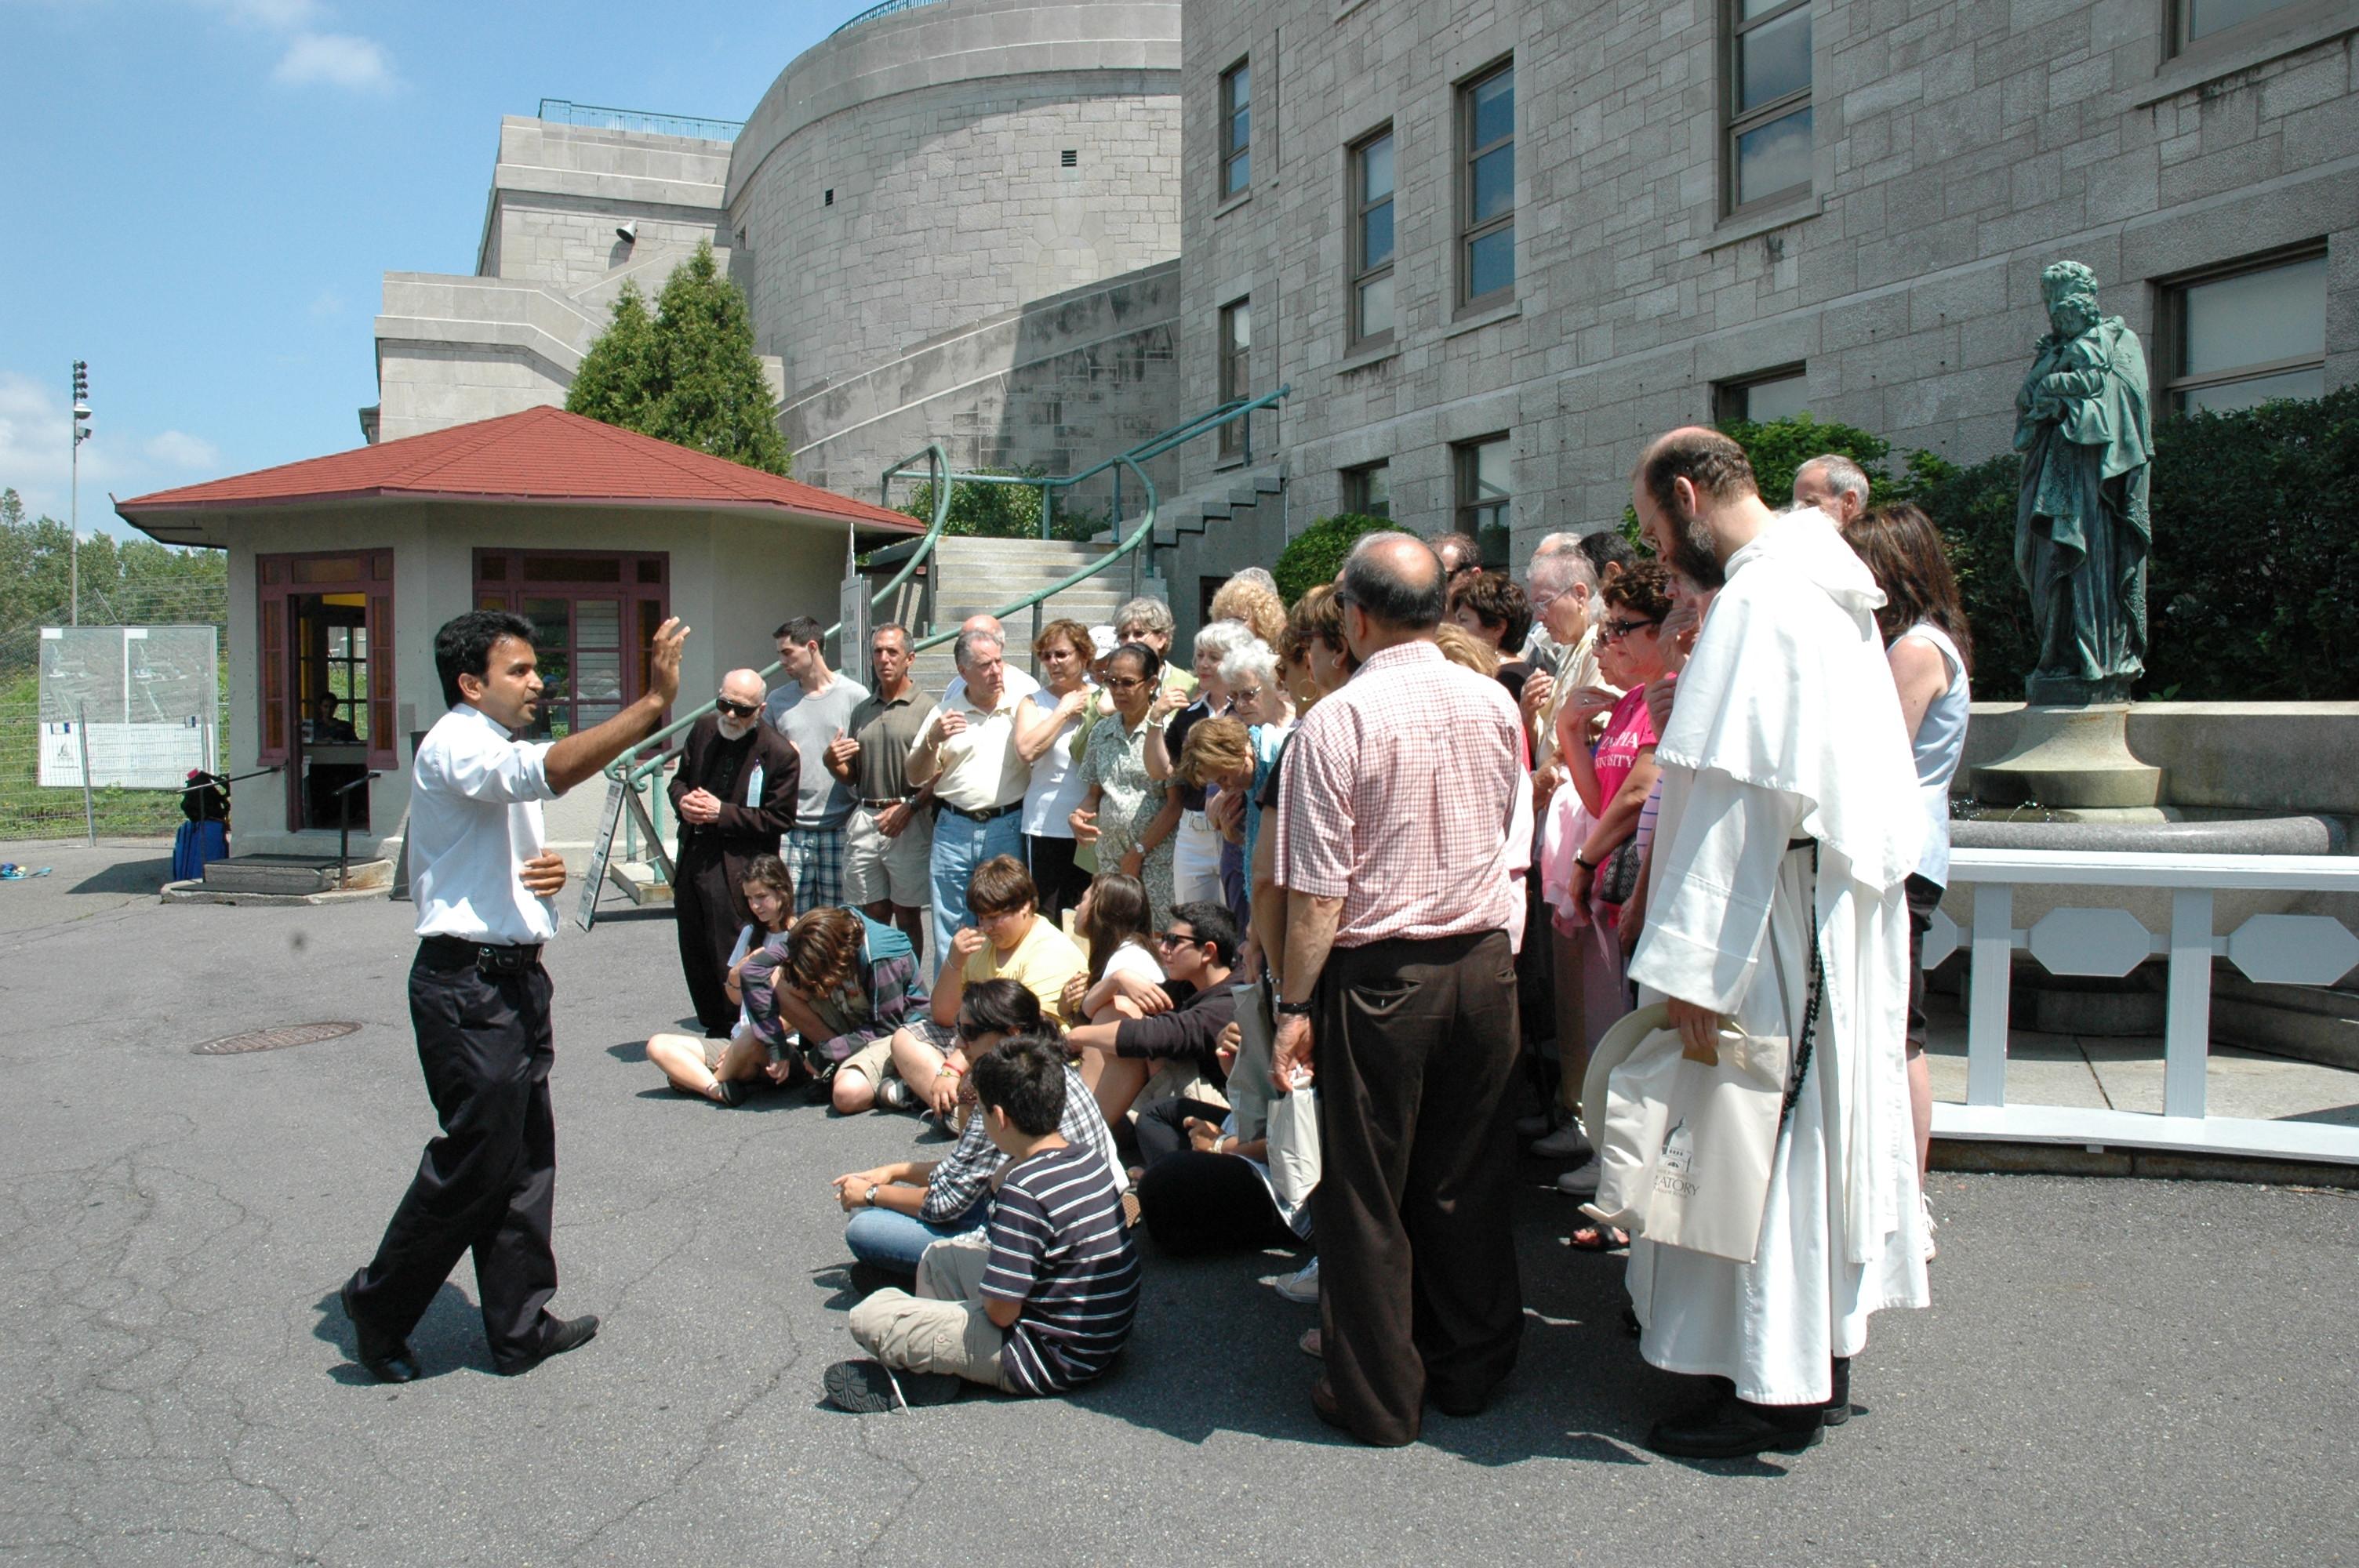 osj-lieudaccueil-pelerinages-benediction